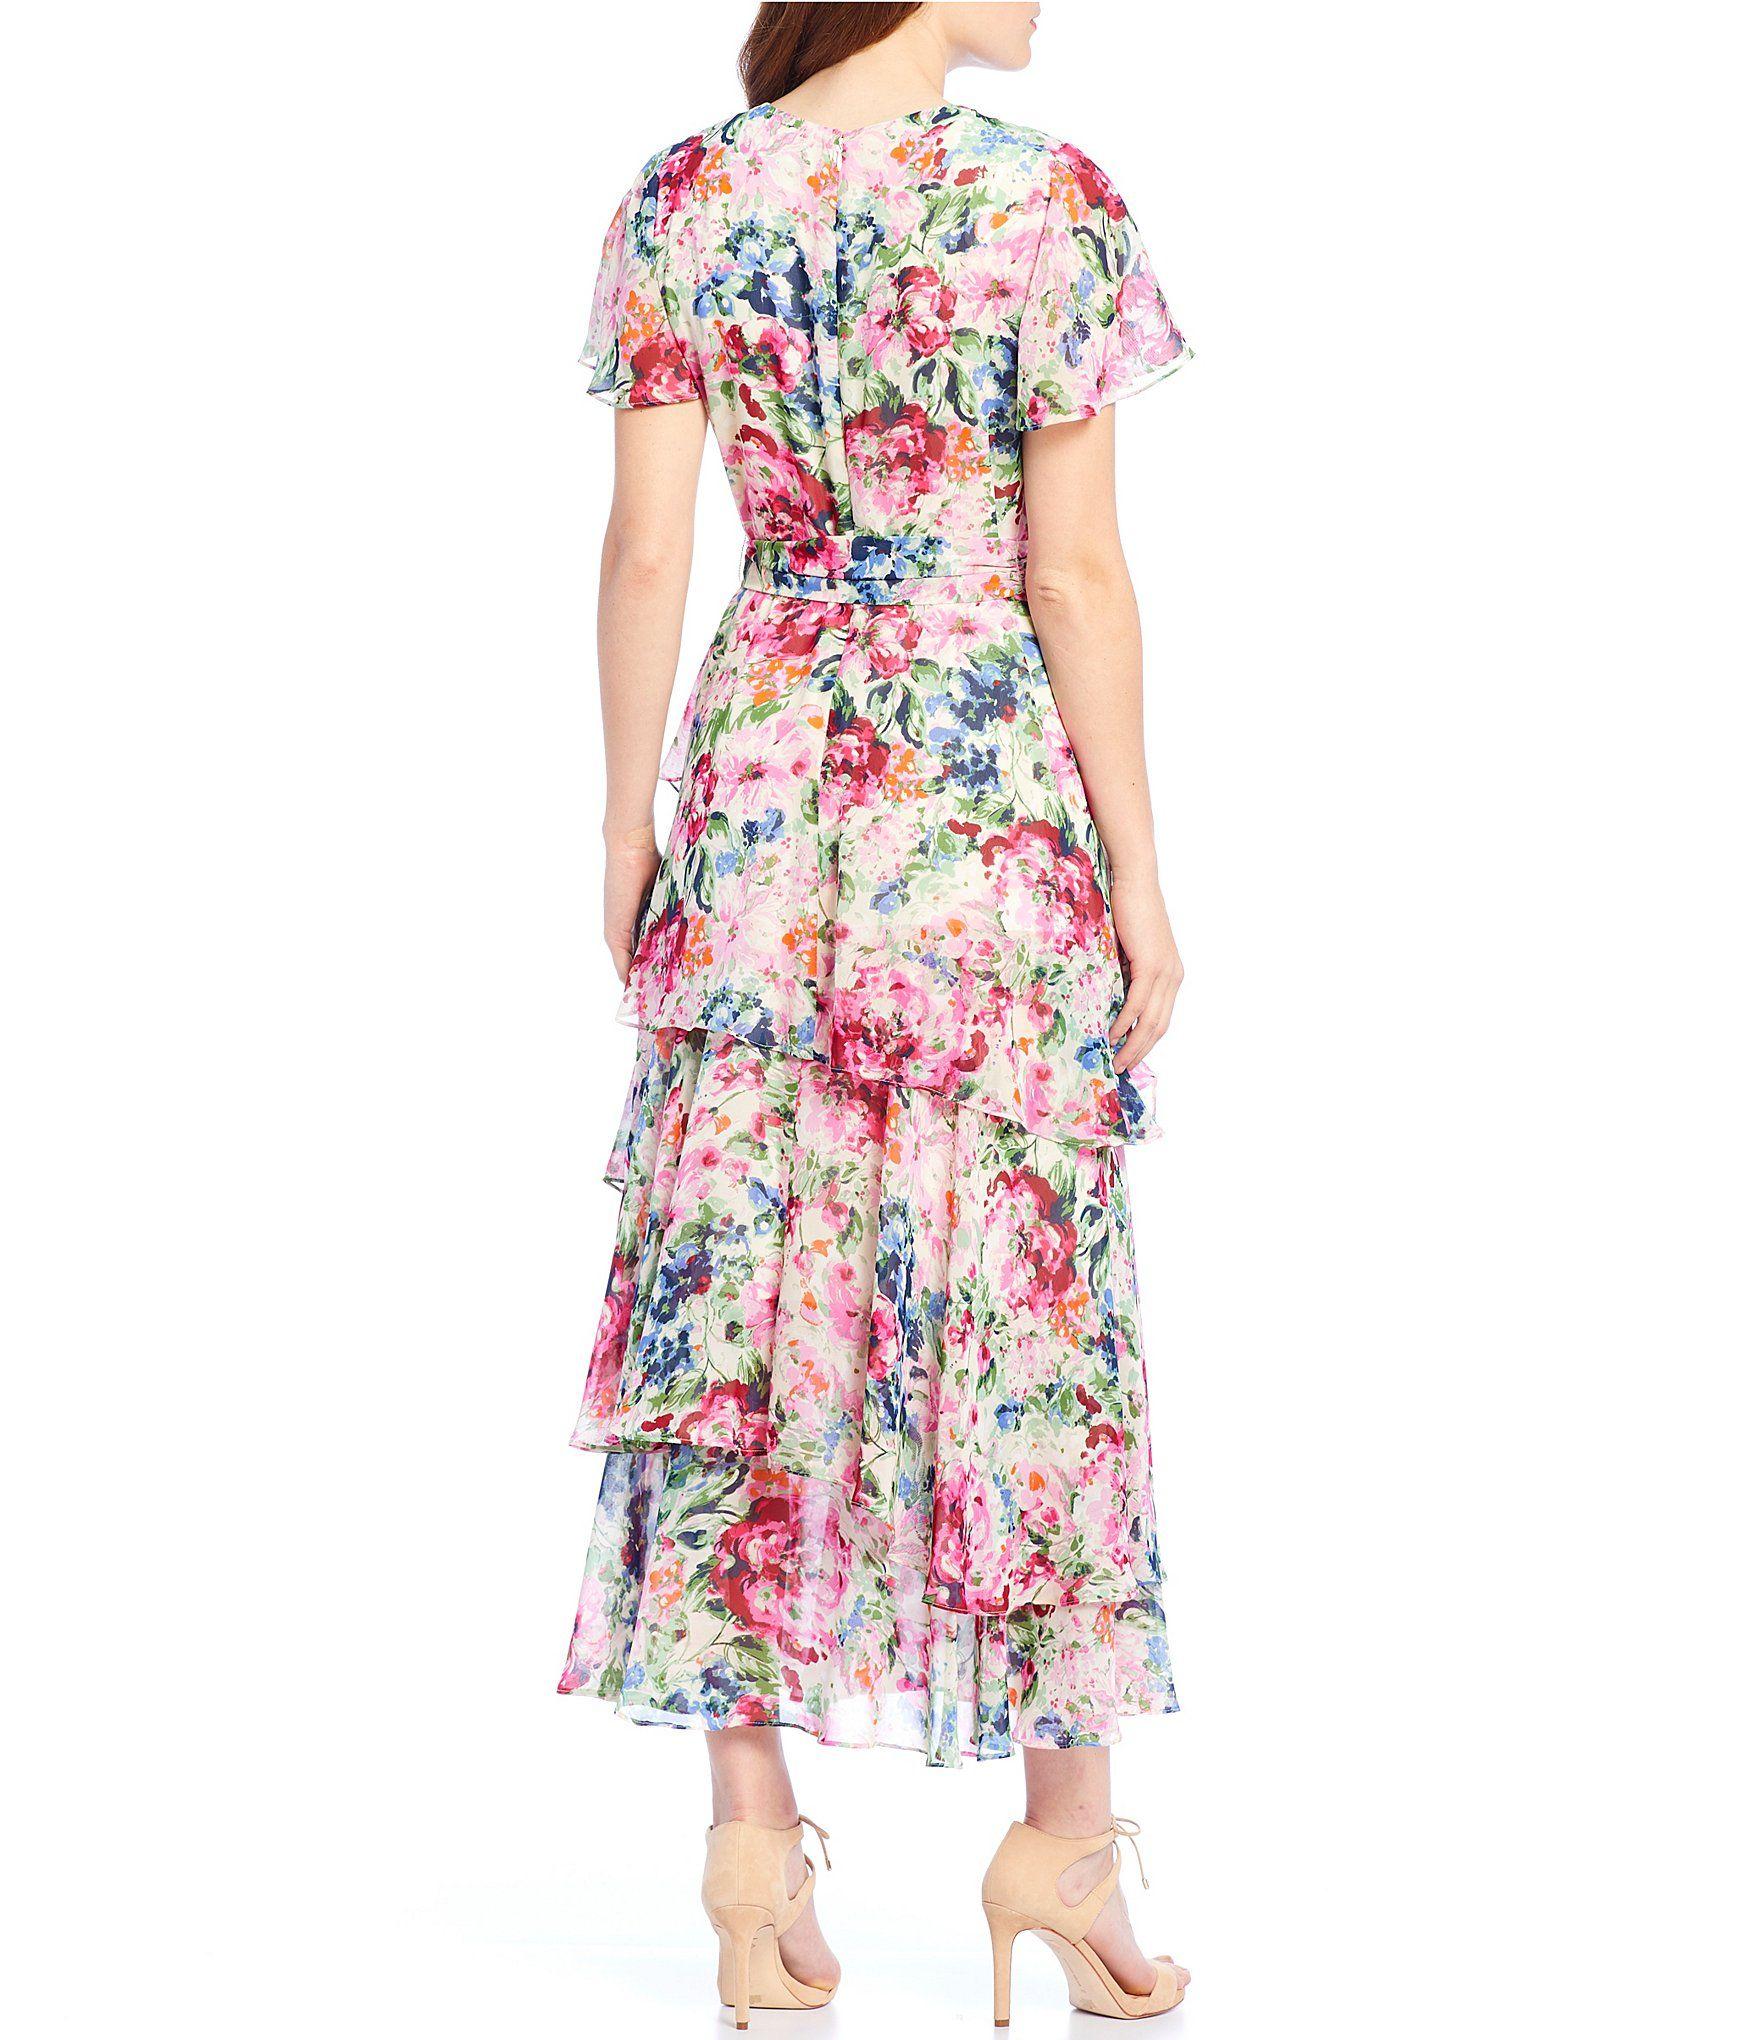 Tahari Asl Faux Wrap Floral Print Maxi Dress Dillards Printed Maxi Dress Floral Print Maxi Dress Maxi Dress [ 2040 x 1760 Pixel ]